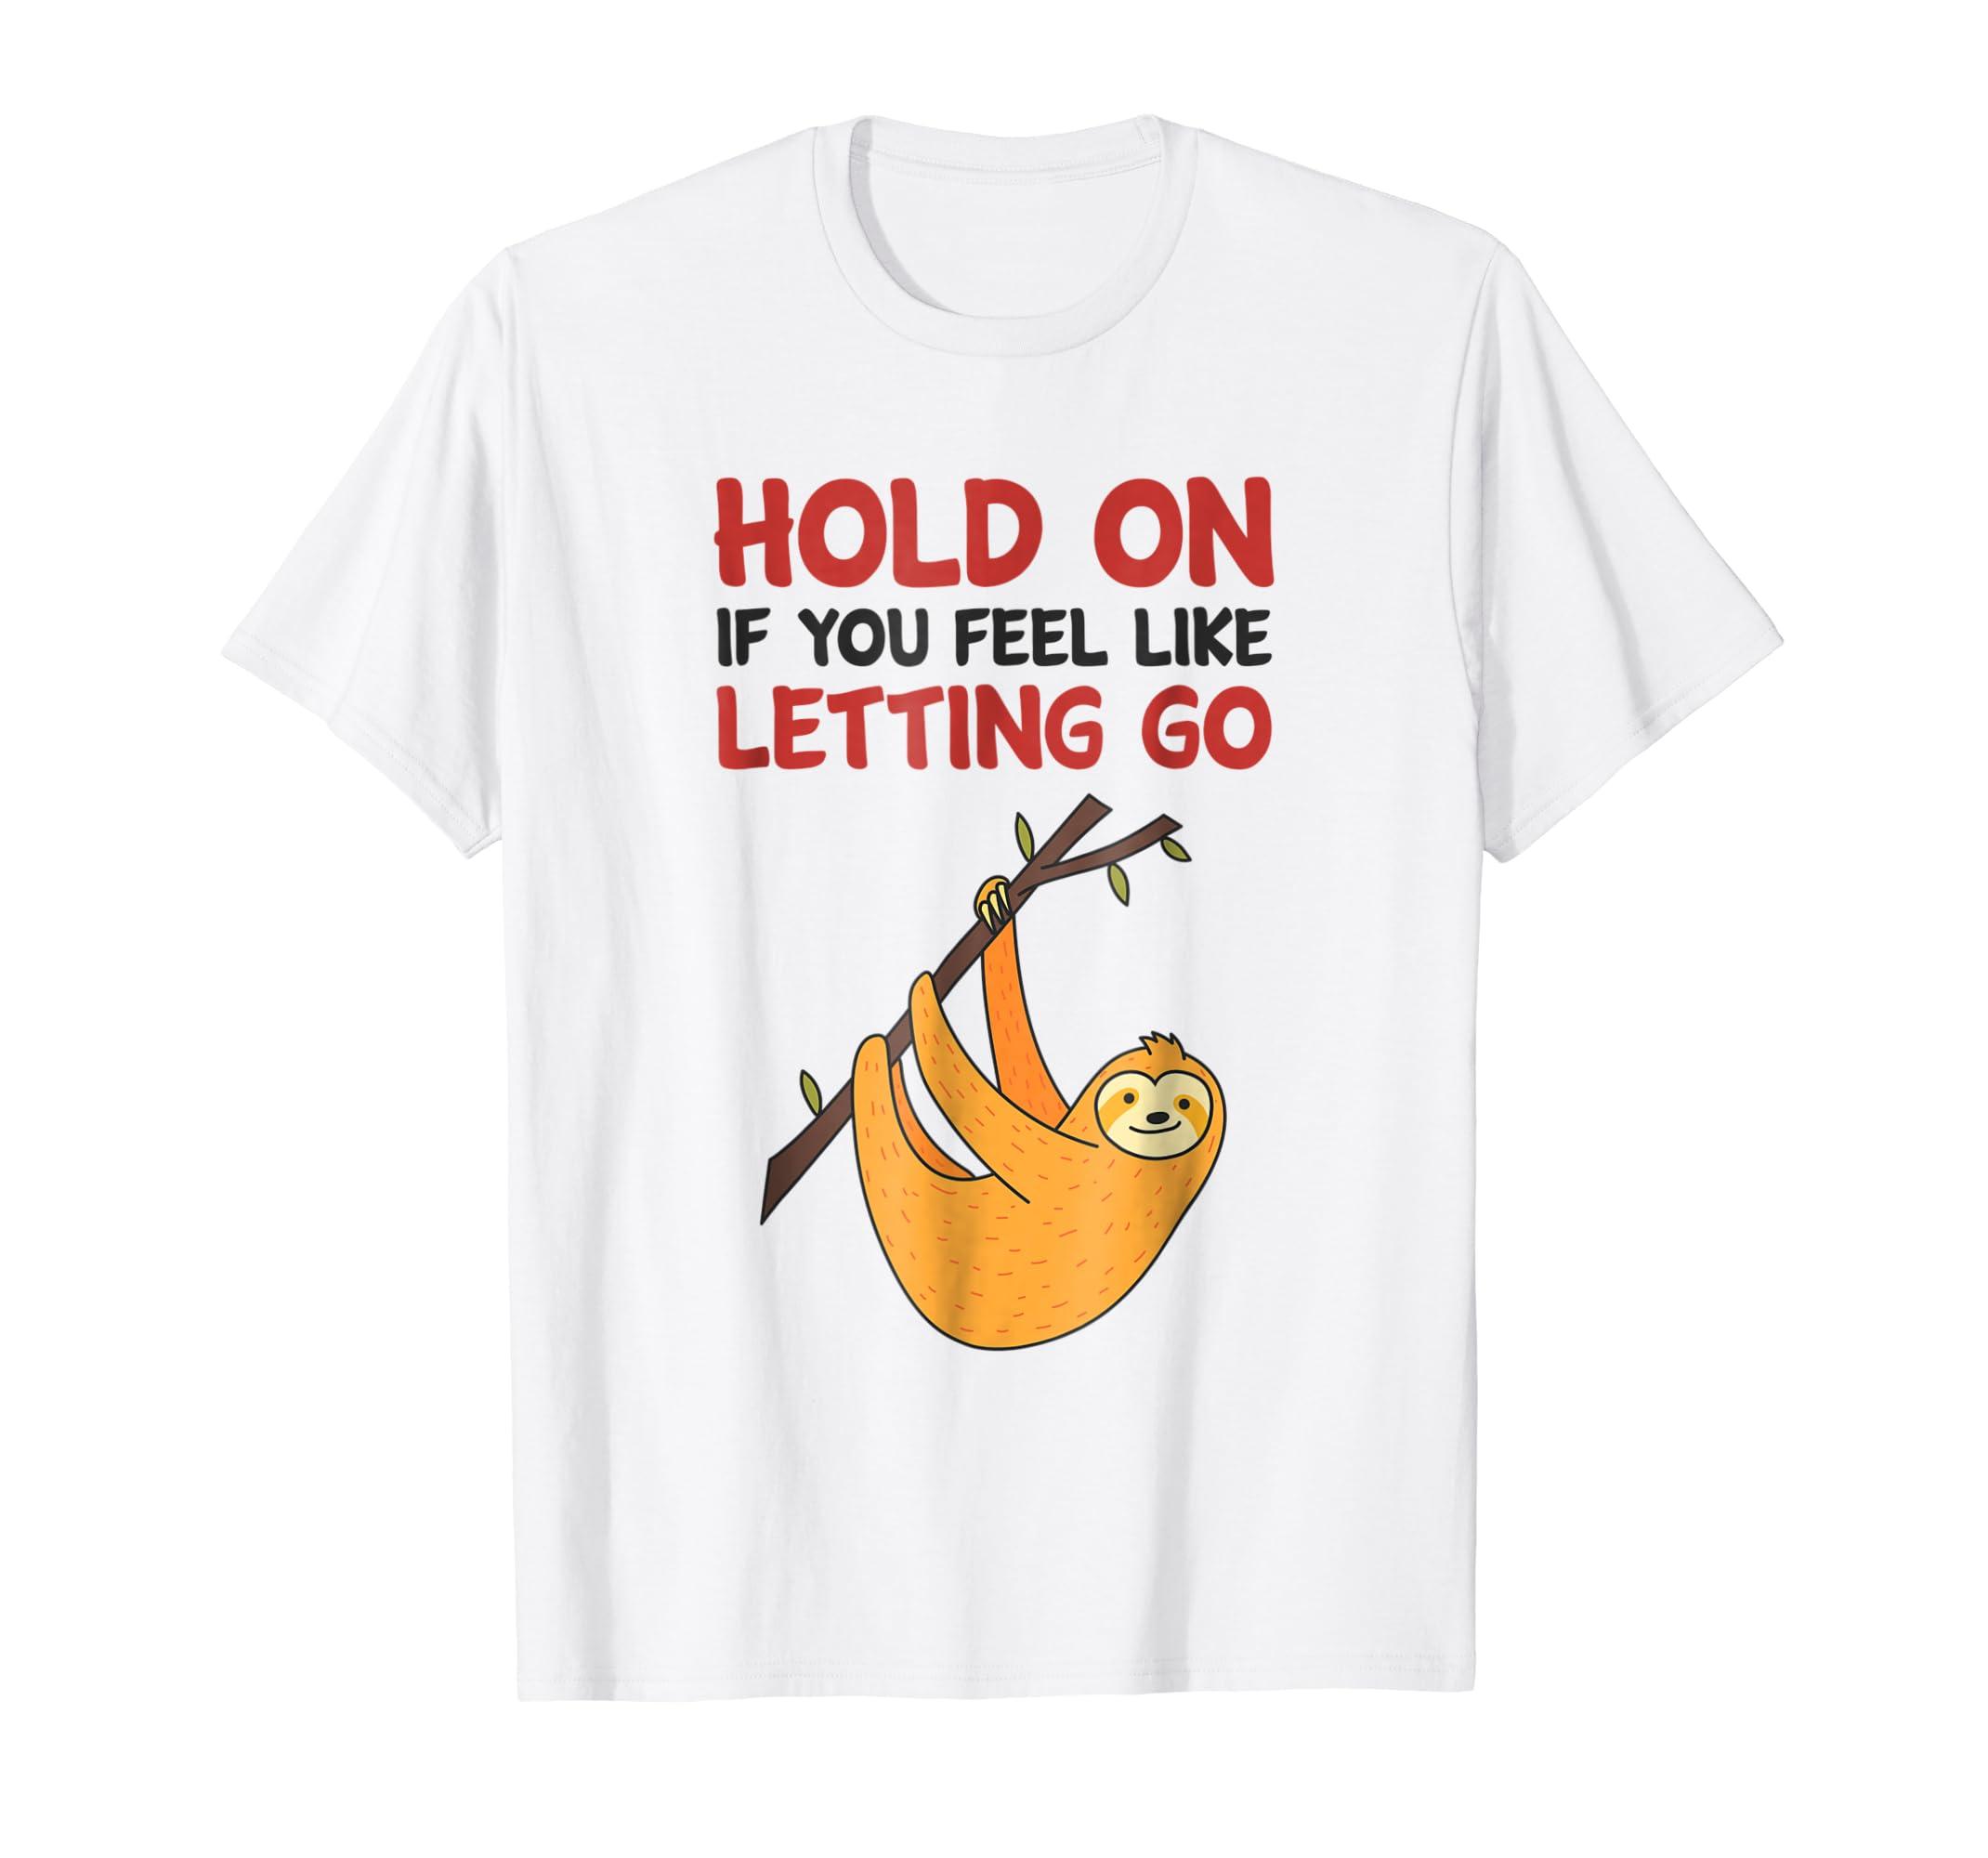 Amazoncom Hold On If You Feel Like Letting Go Shirt Sloth Shirt